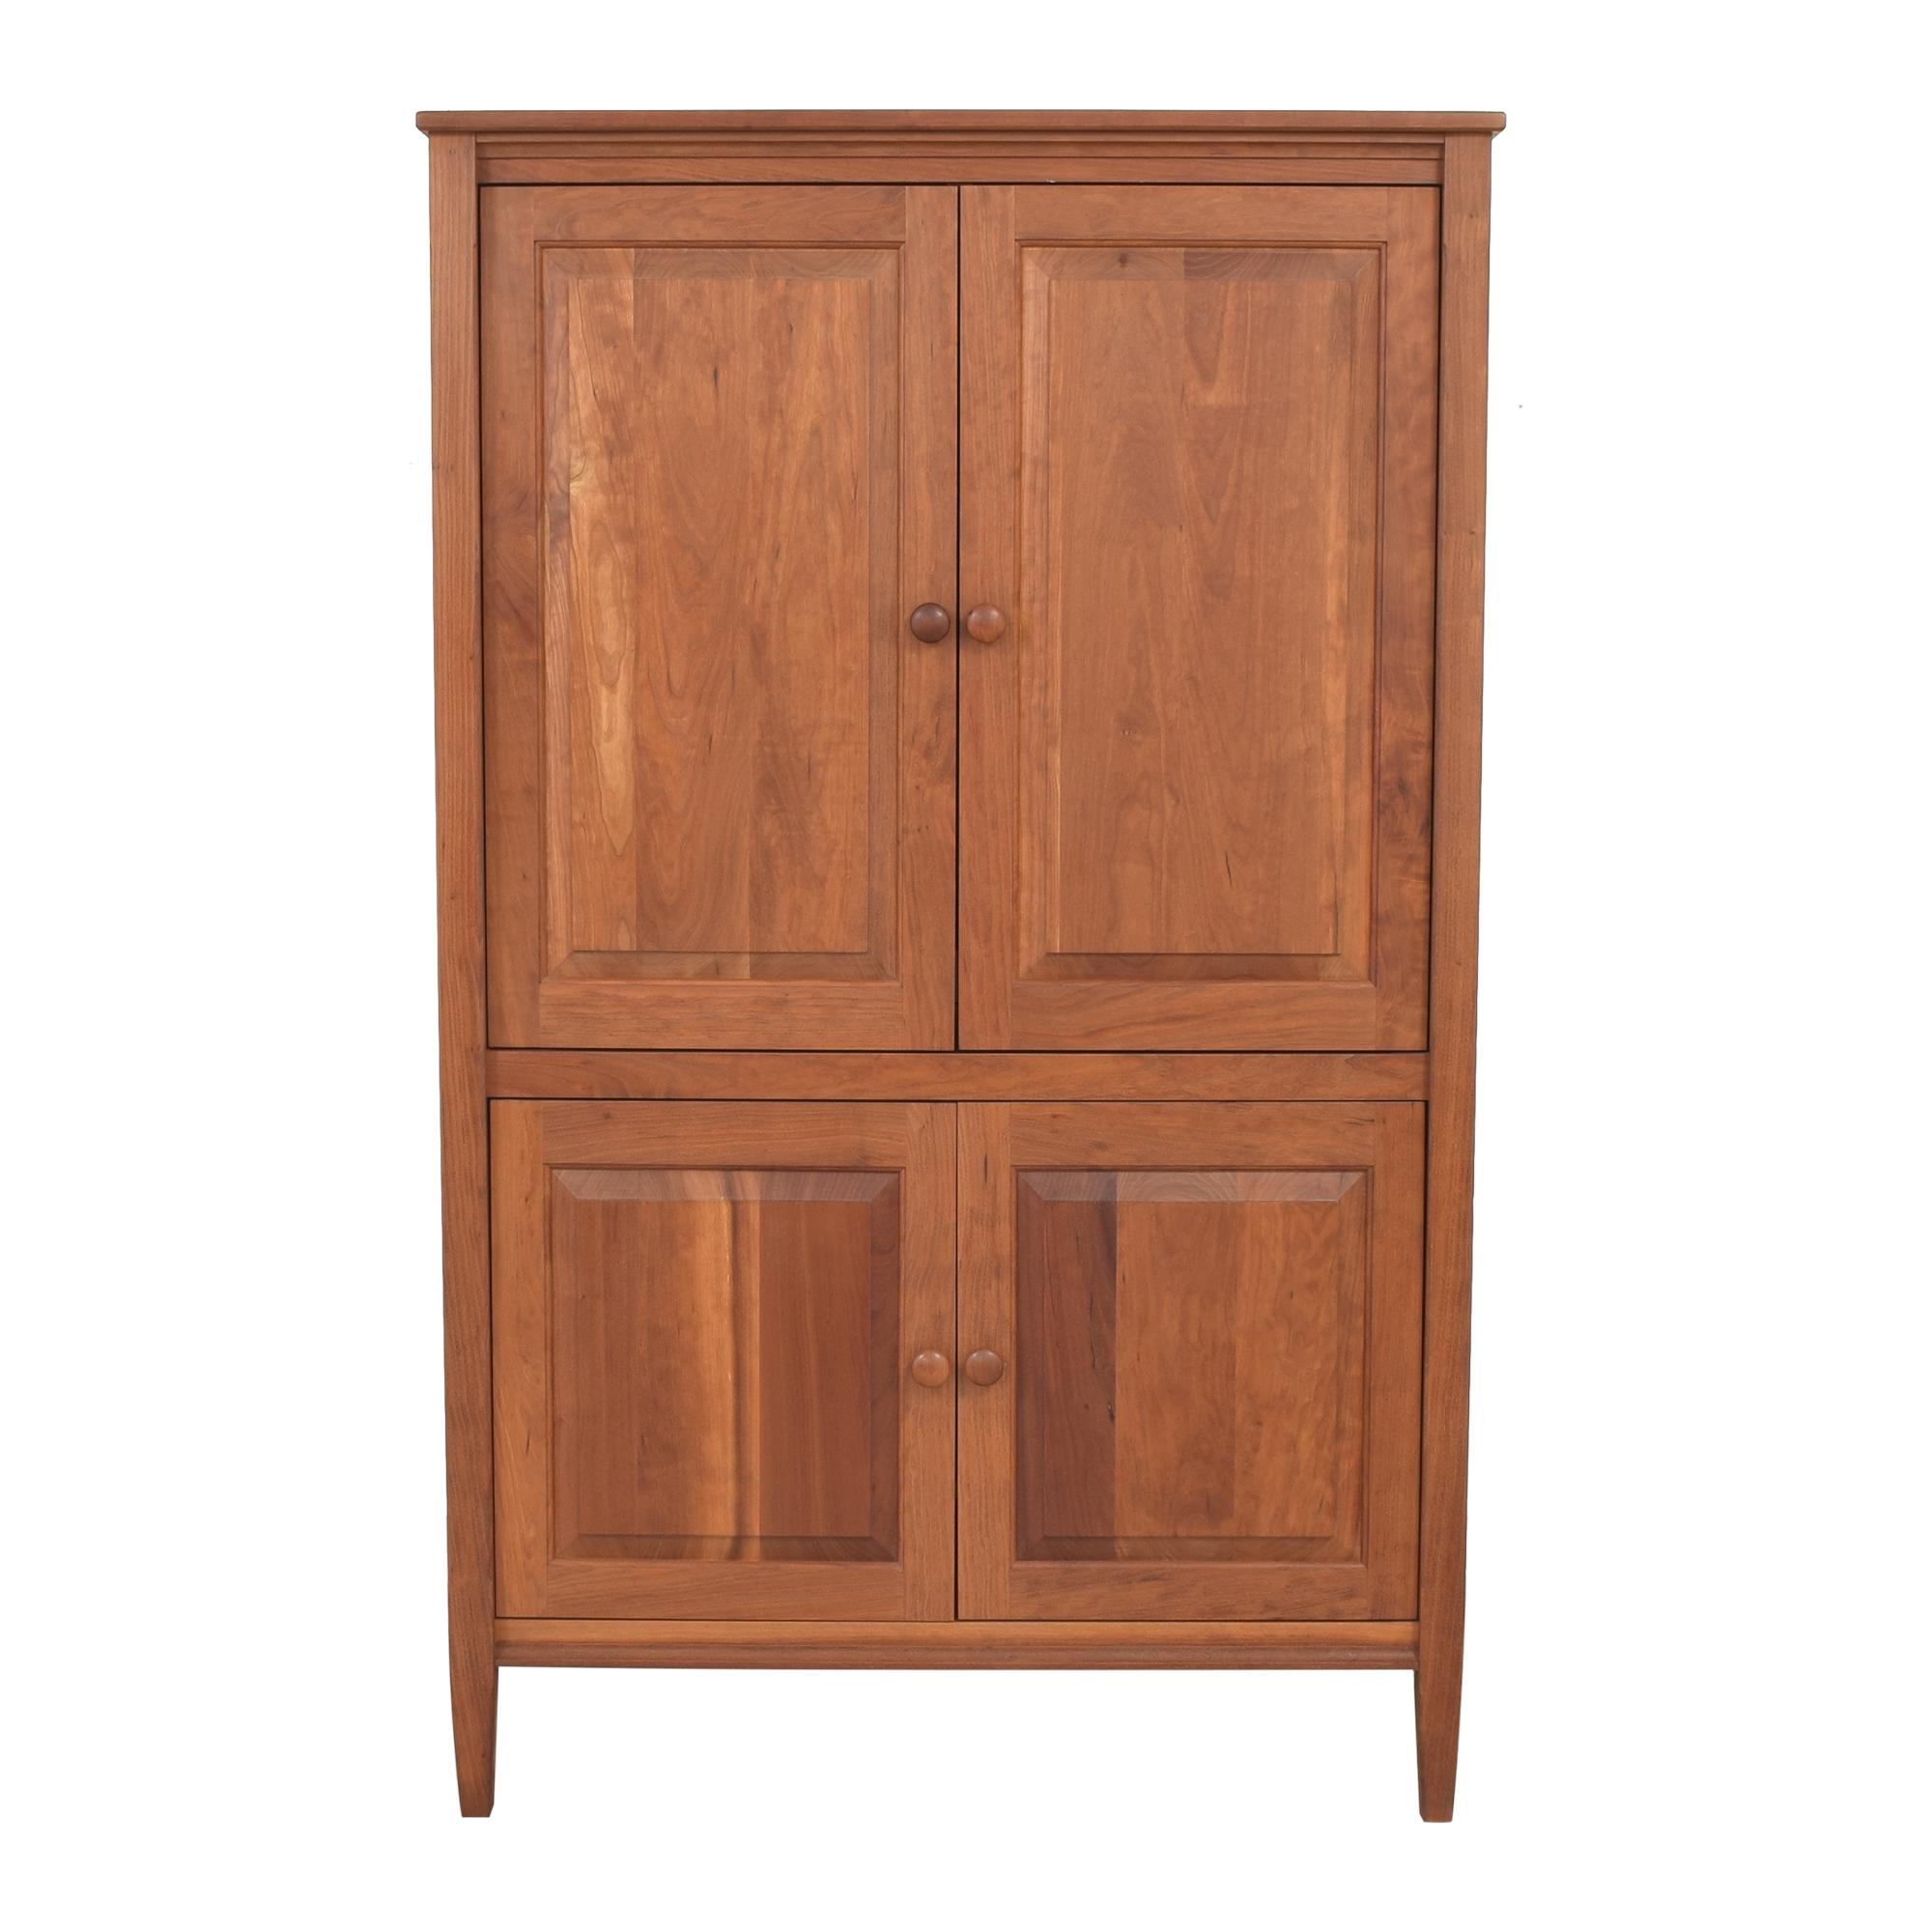 Scott Jordan Furniture Mission Armoire / Storage